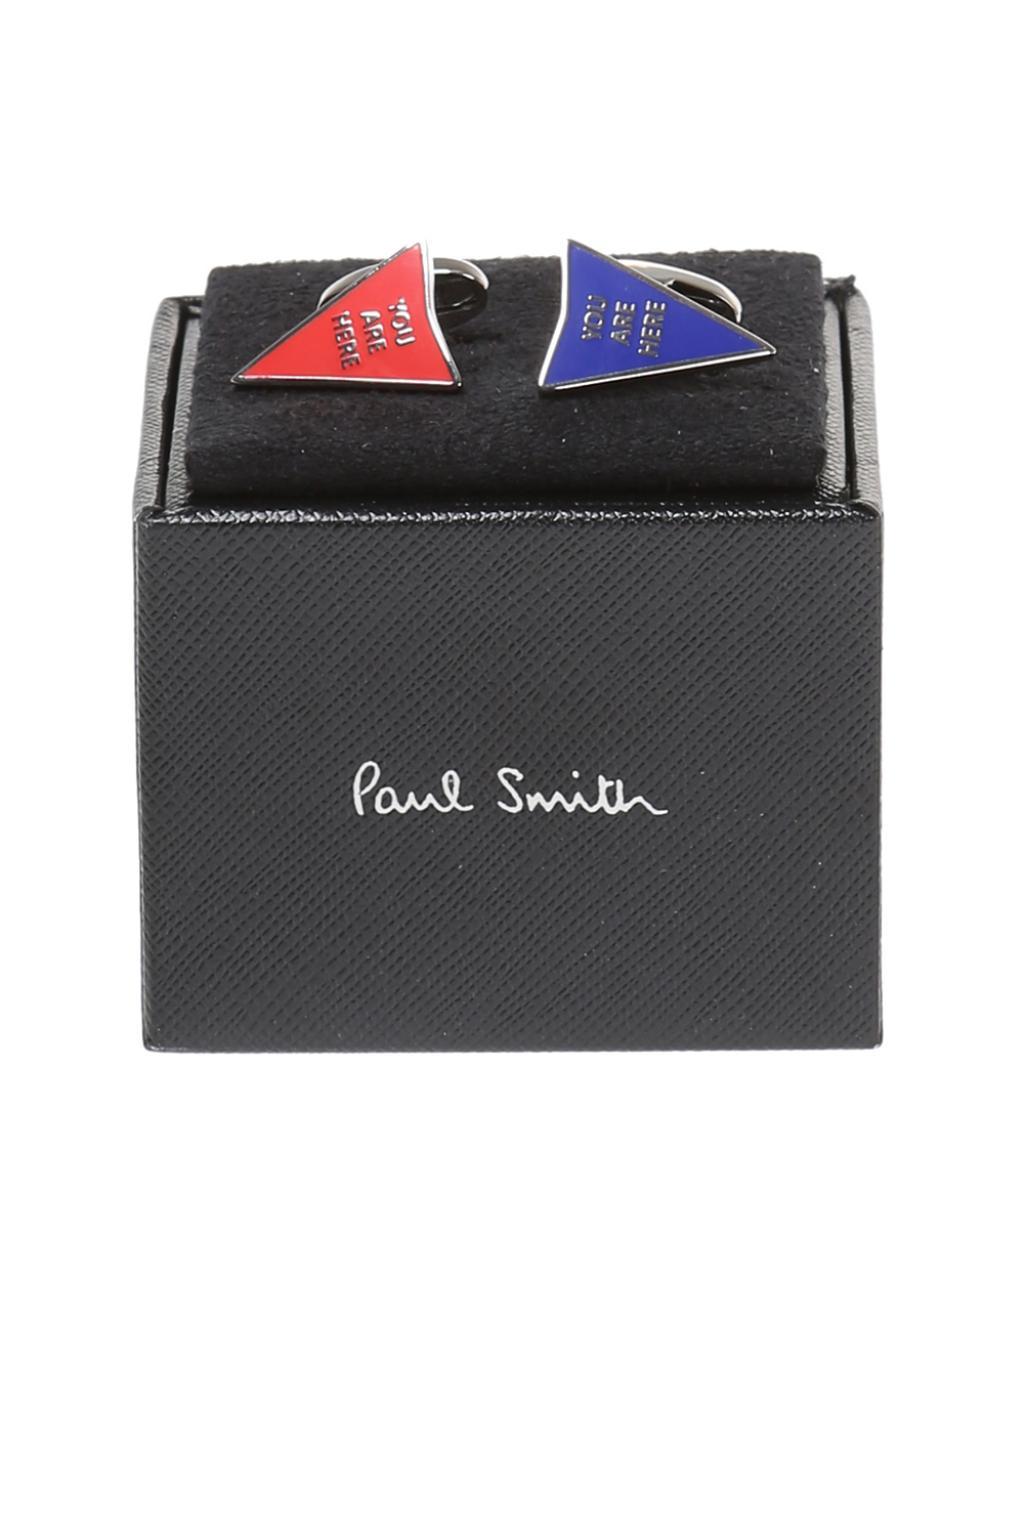 Paul Smith Triangular cuff links